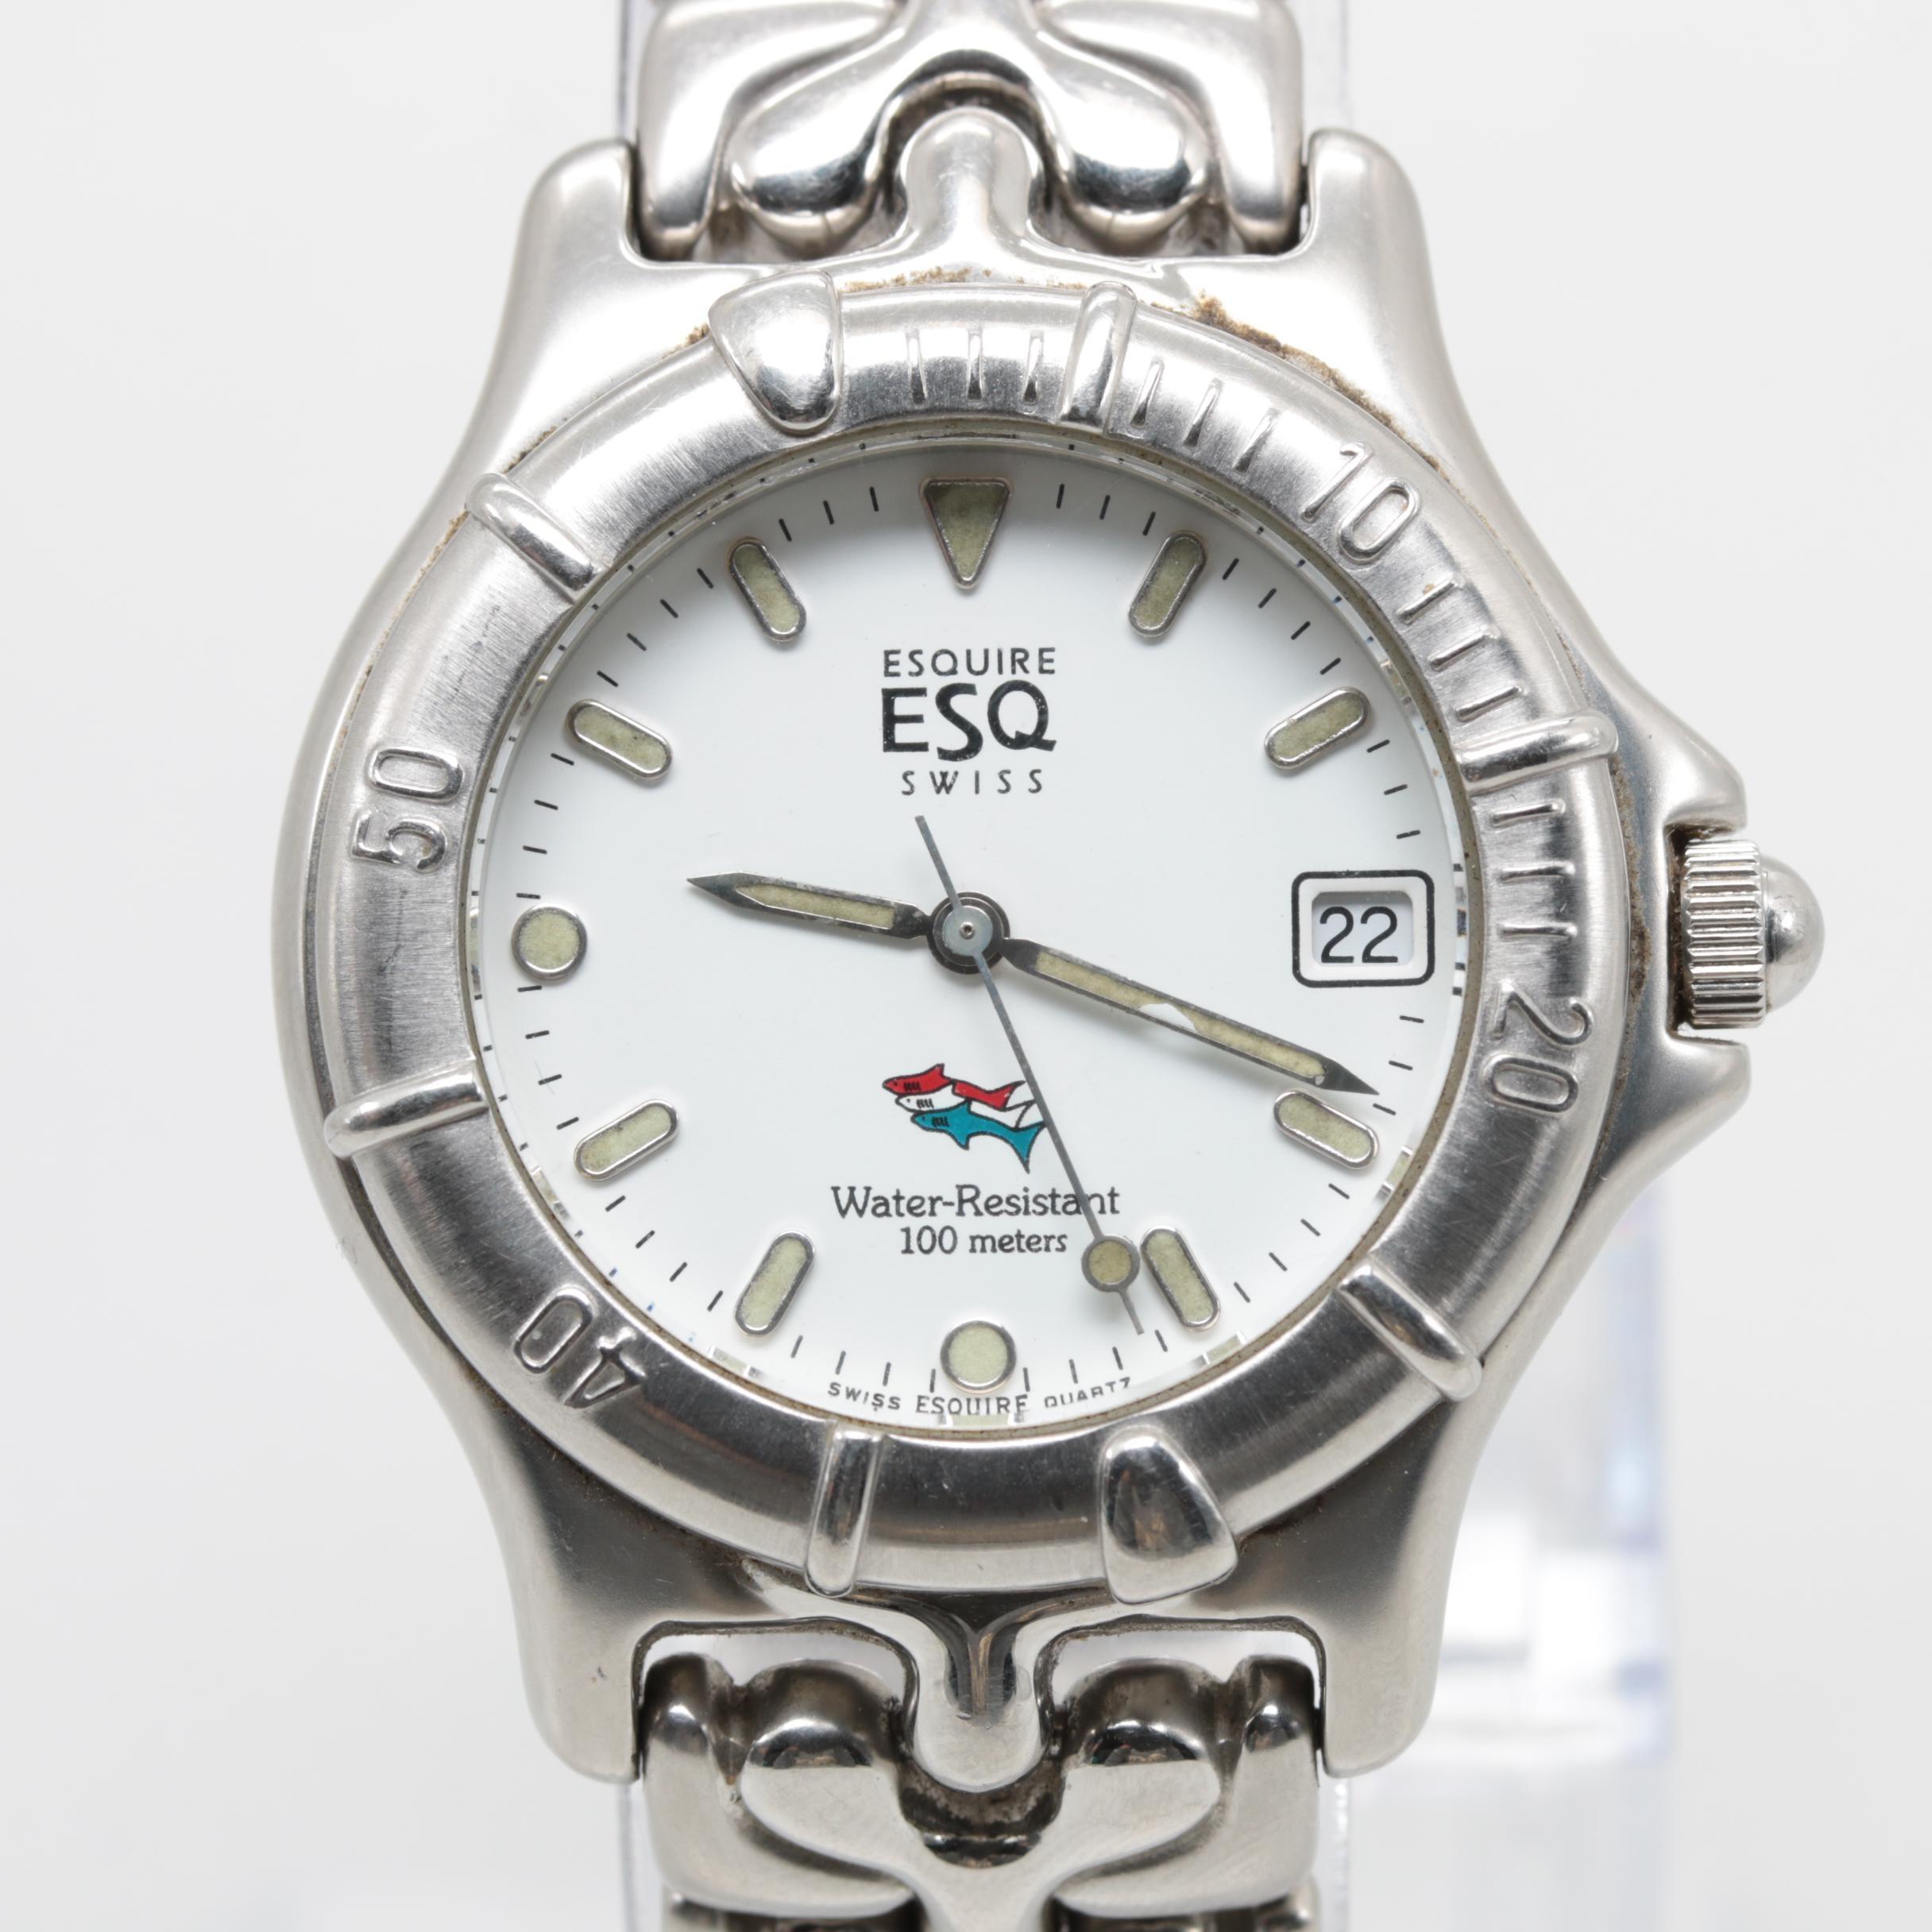 ESQ Stainless Steel Model 300240B Quartz Wristwatch